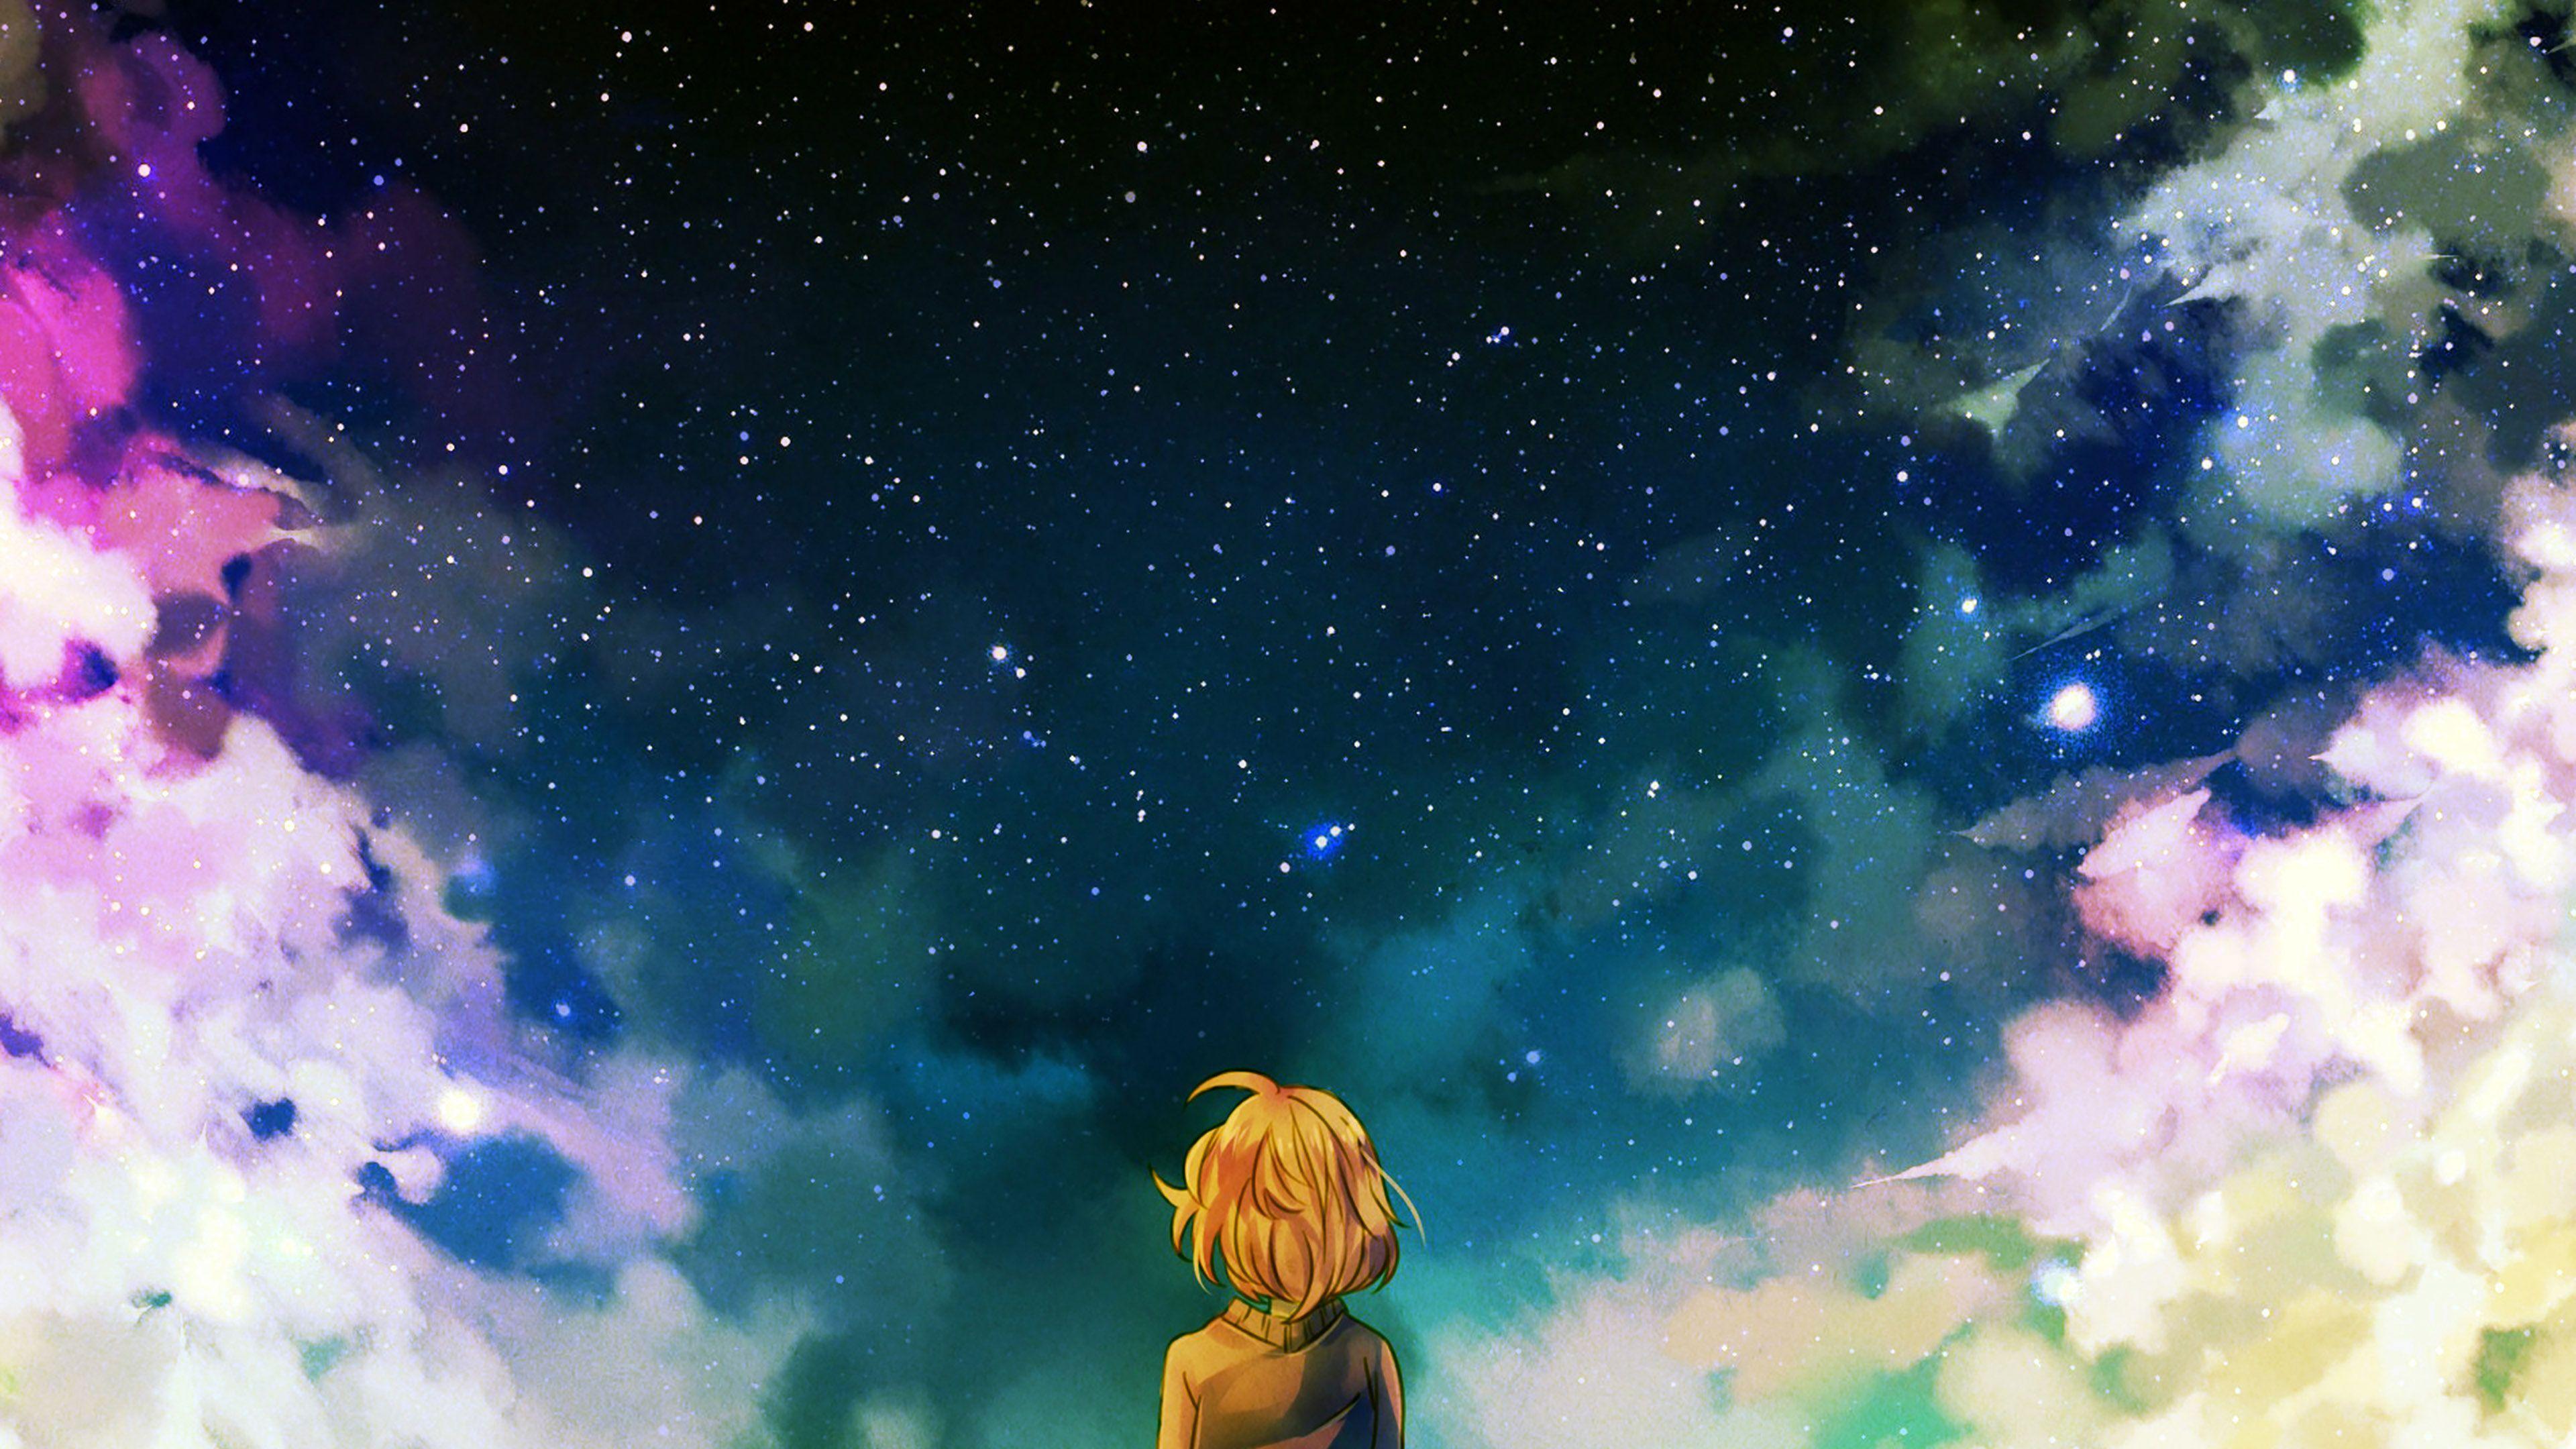 Anime Wallpaper Pesquisa Google Cool Anime Wallpapers Hd Anime Wallpapers Anime Wallpaper Download